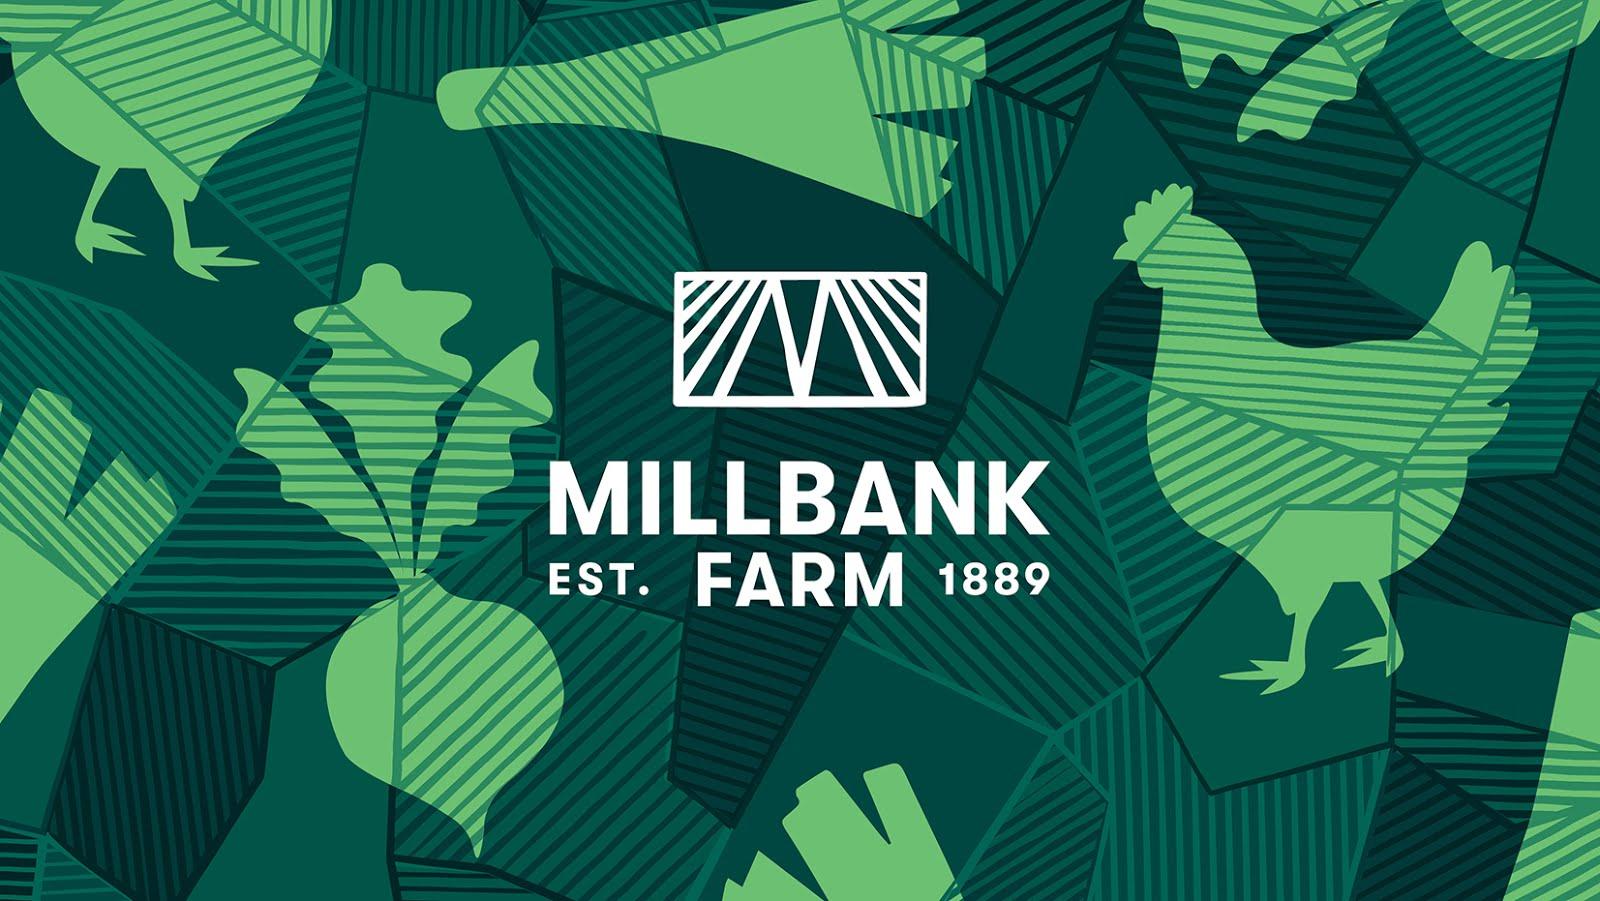 jrs_millbankfarm_1